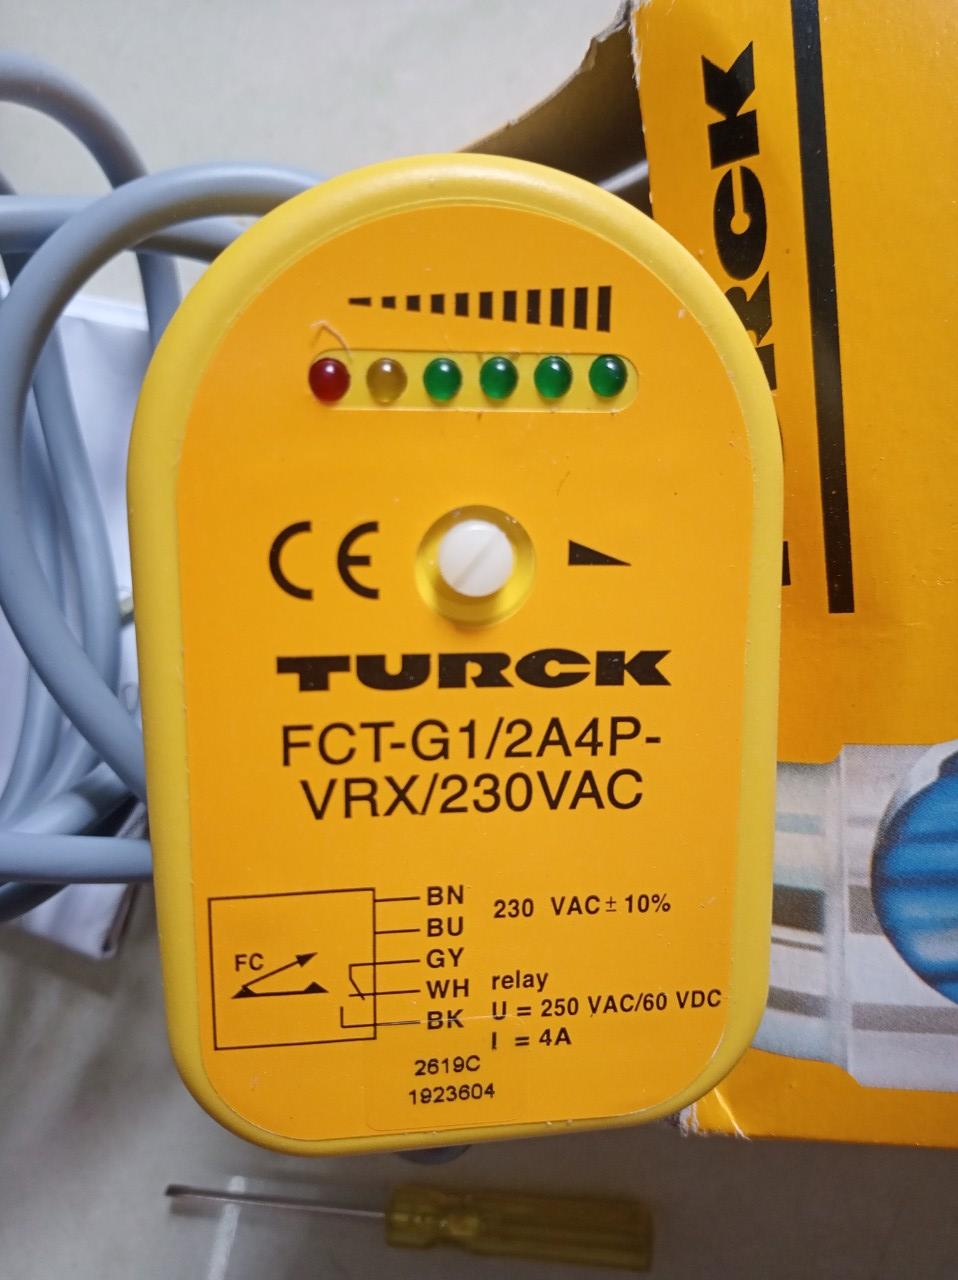 Cảm biến TURCK FCT-G1/2A4P-VRX/230VAC